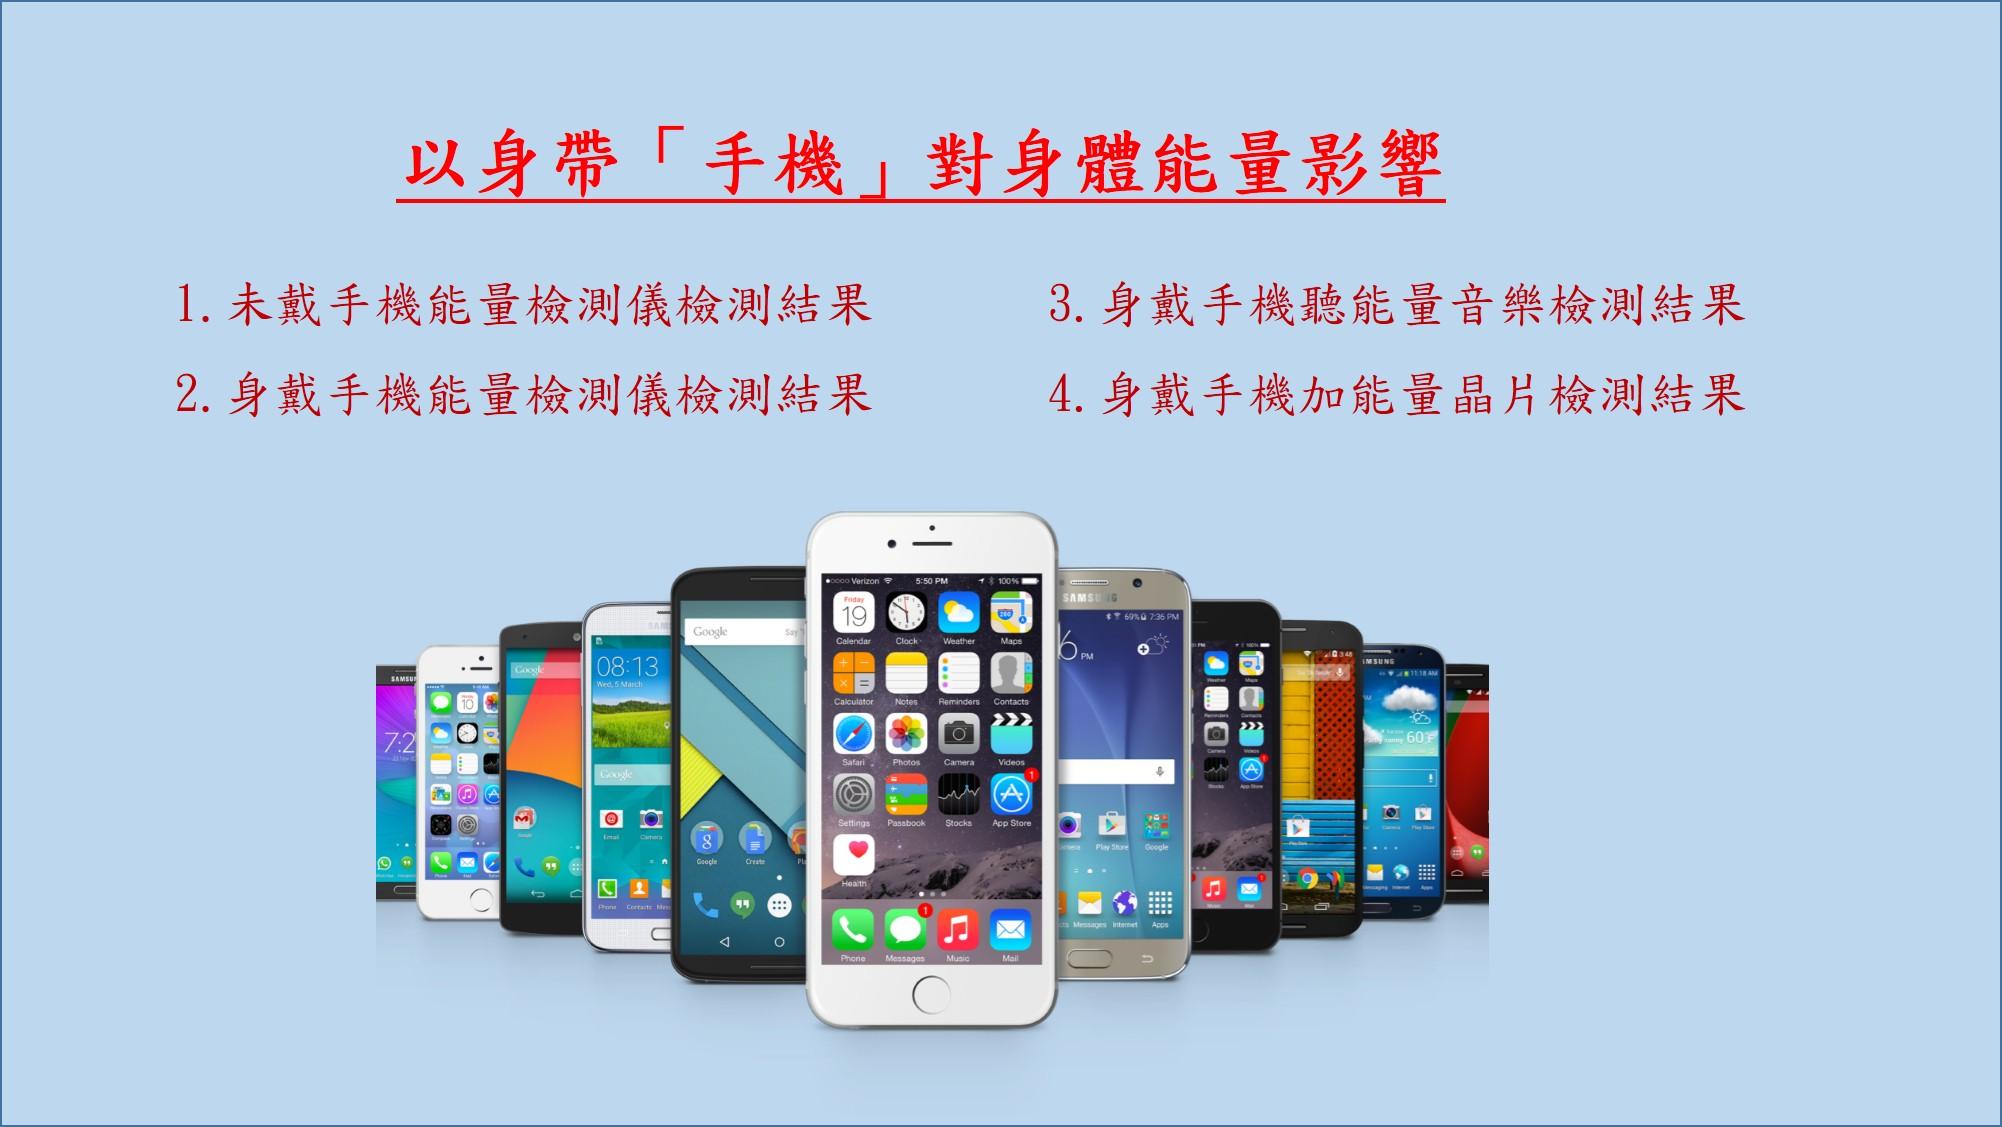 http://taiwancom.tw/biochip/biowell-9.jpg